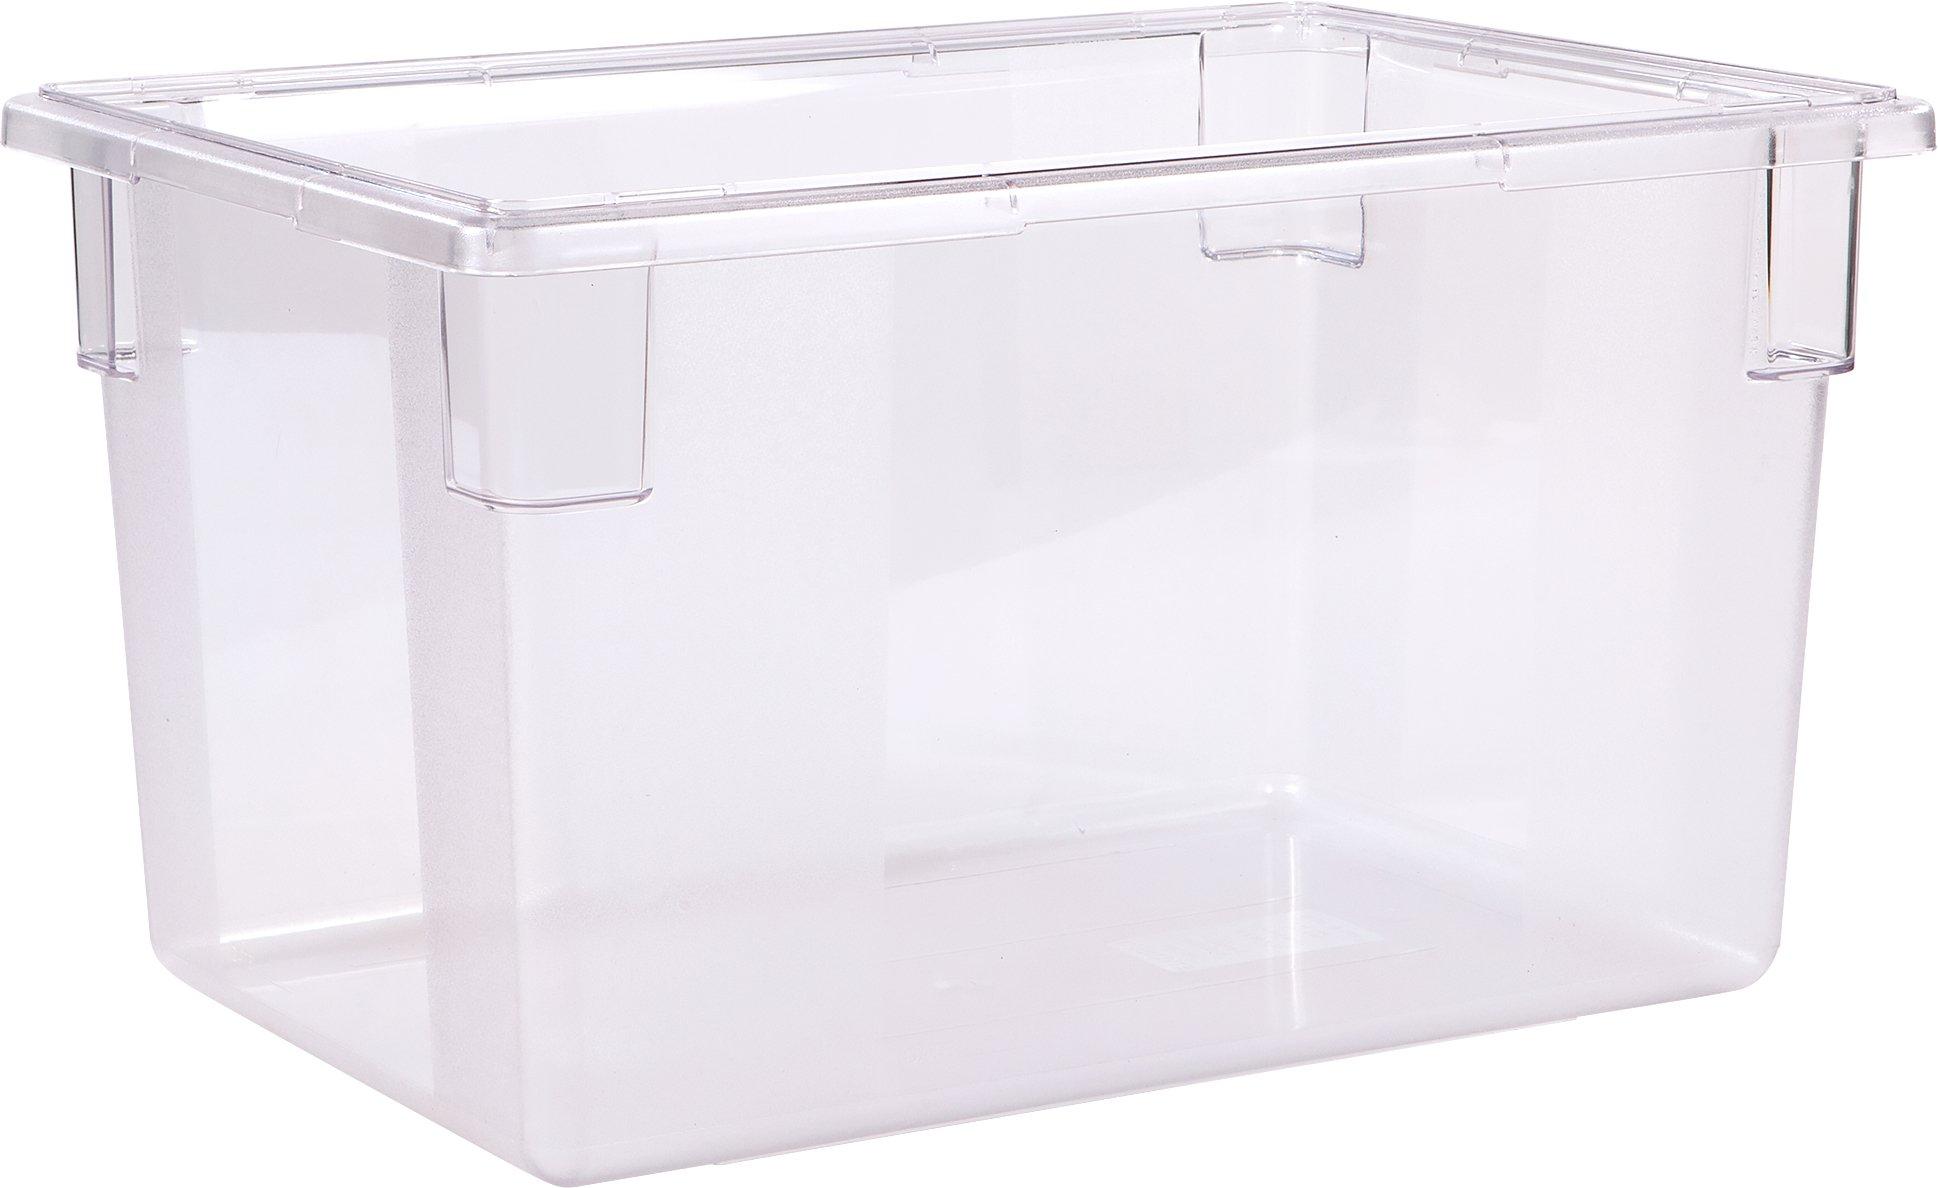 Carlisle  (1062407) 21-1/2 gal StorPlus Food Storage Box [Set of 3]